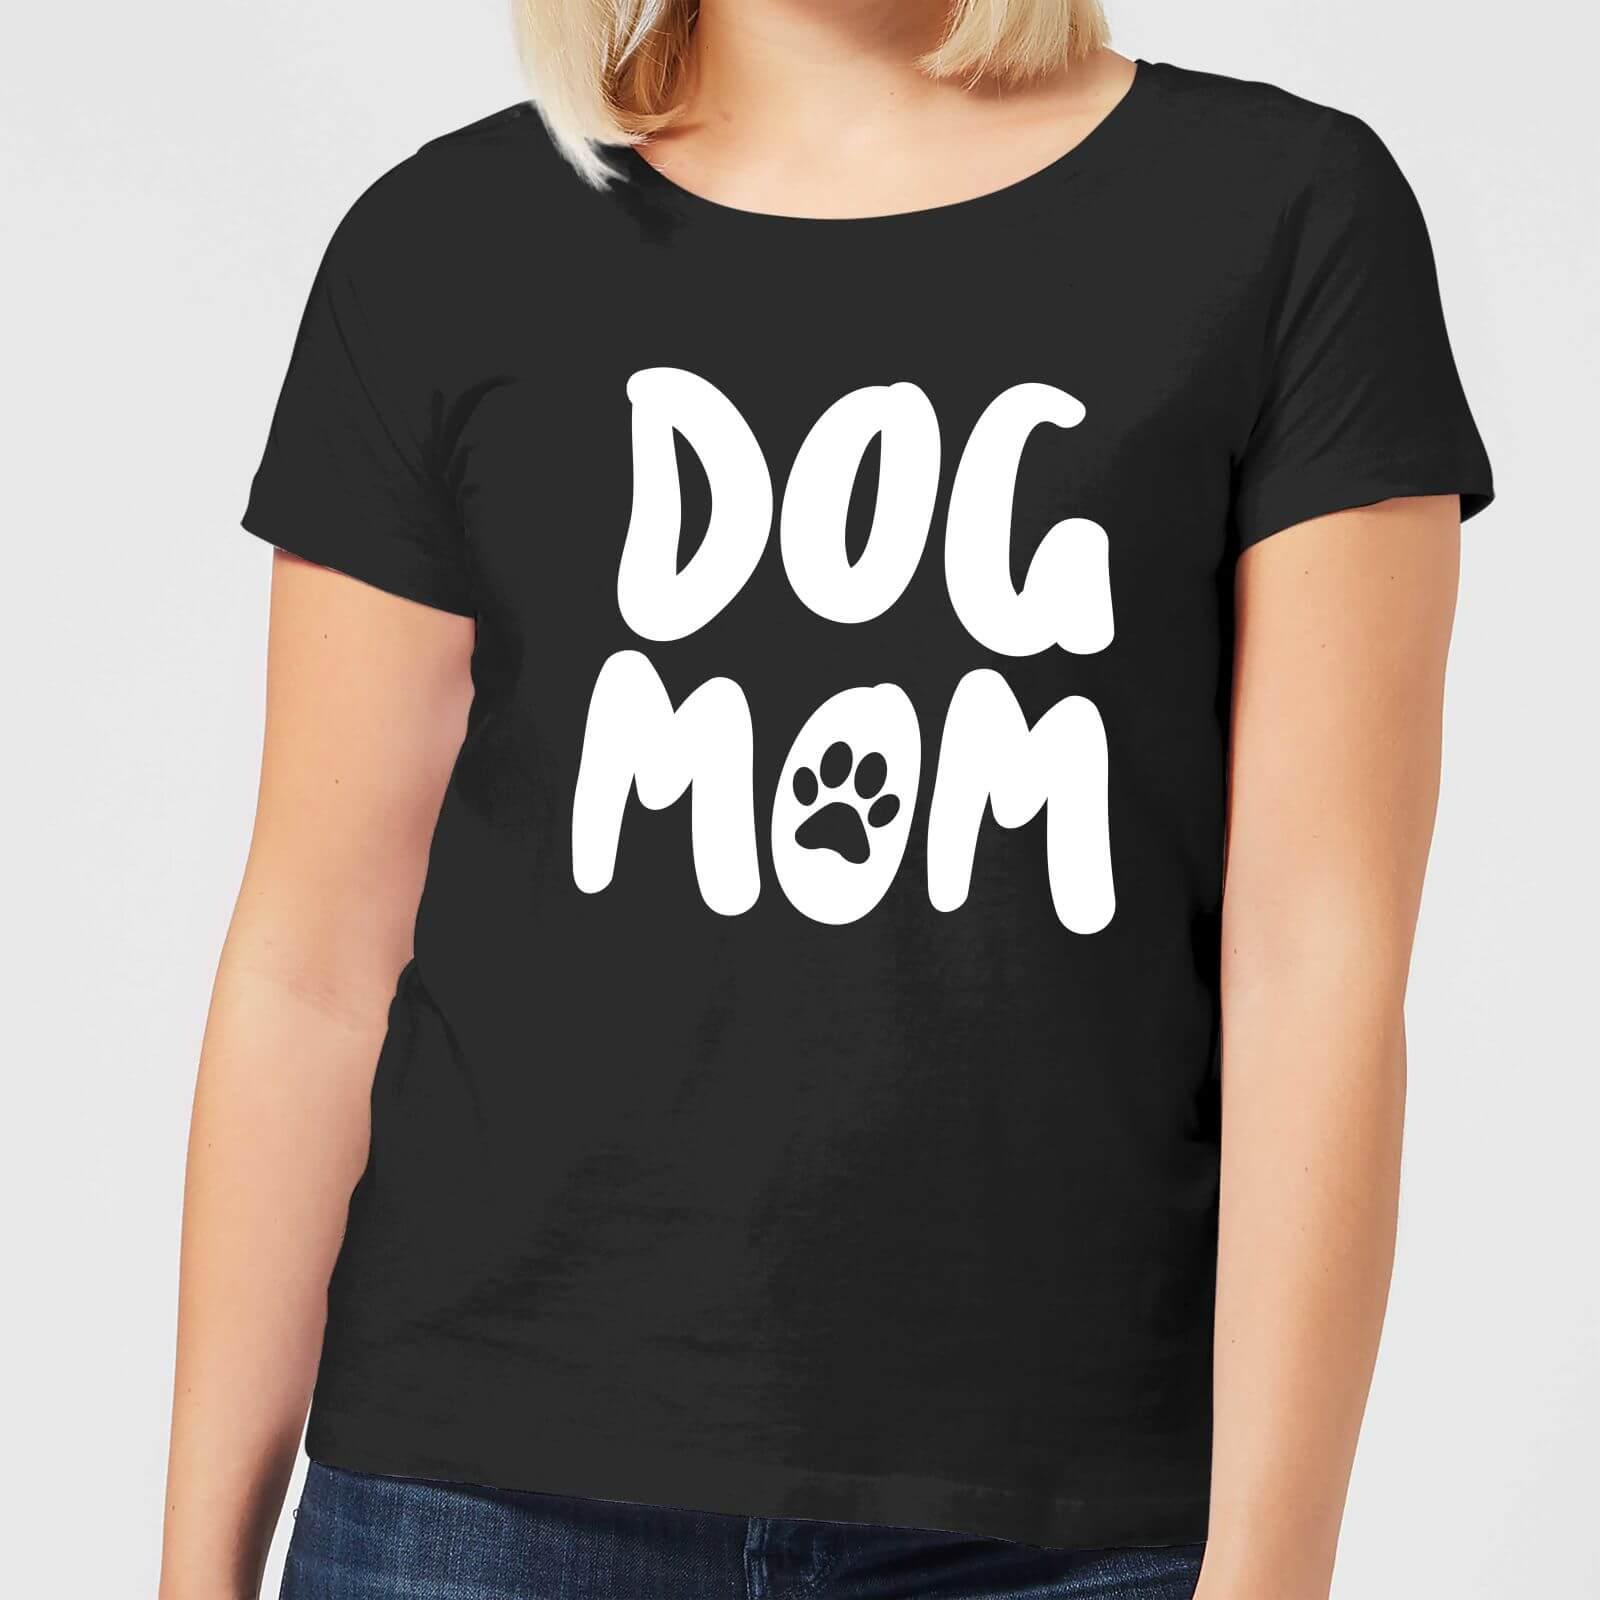 By IWOOT Dog Mom Women's T-Shirt - Black - XS - Black